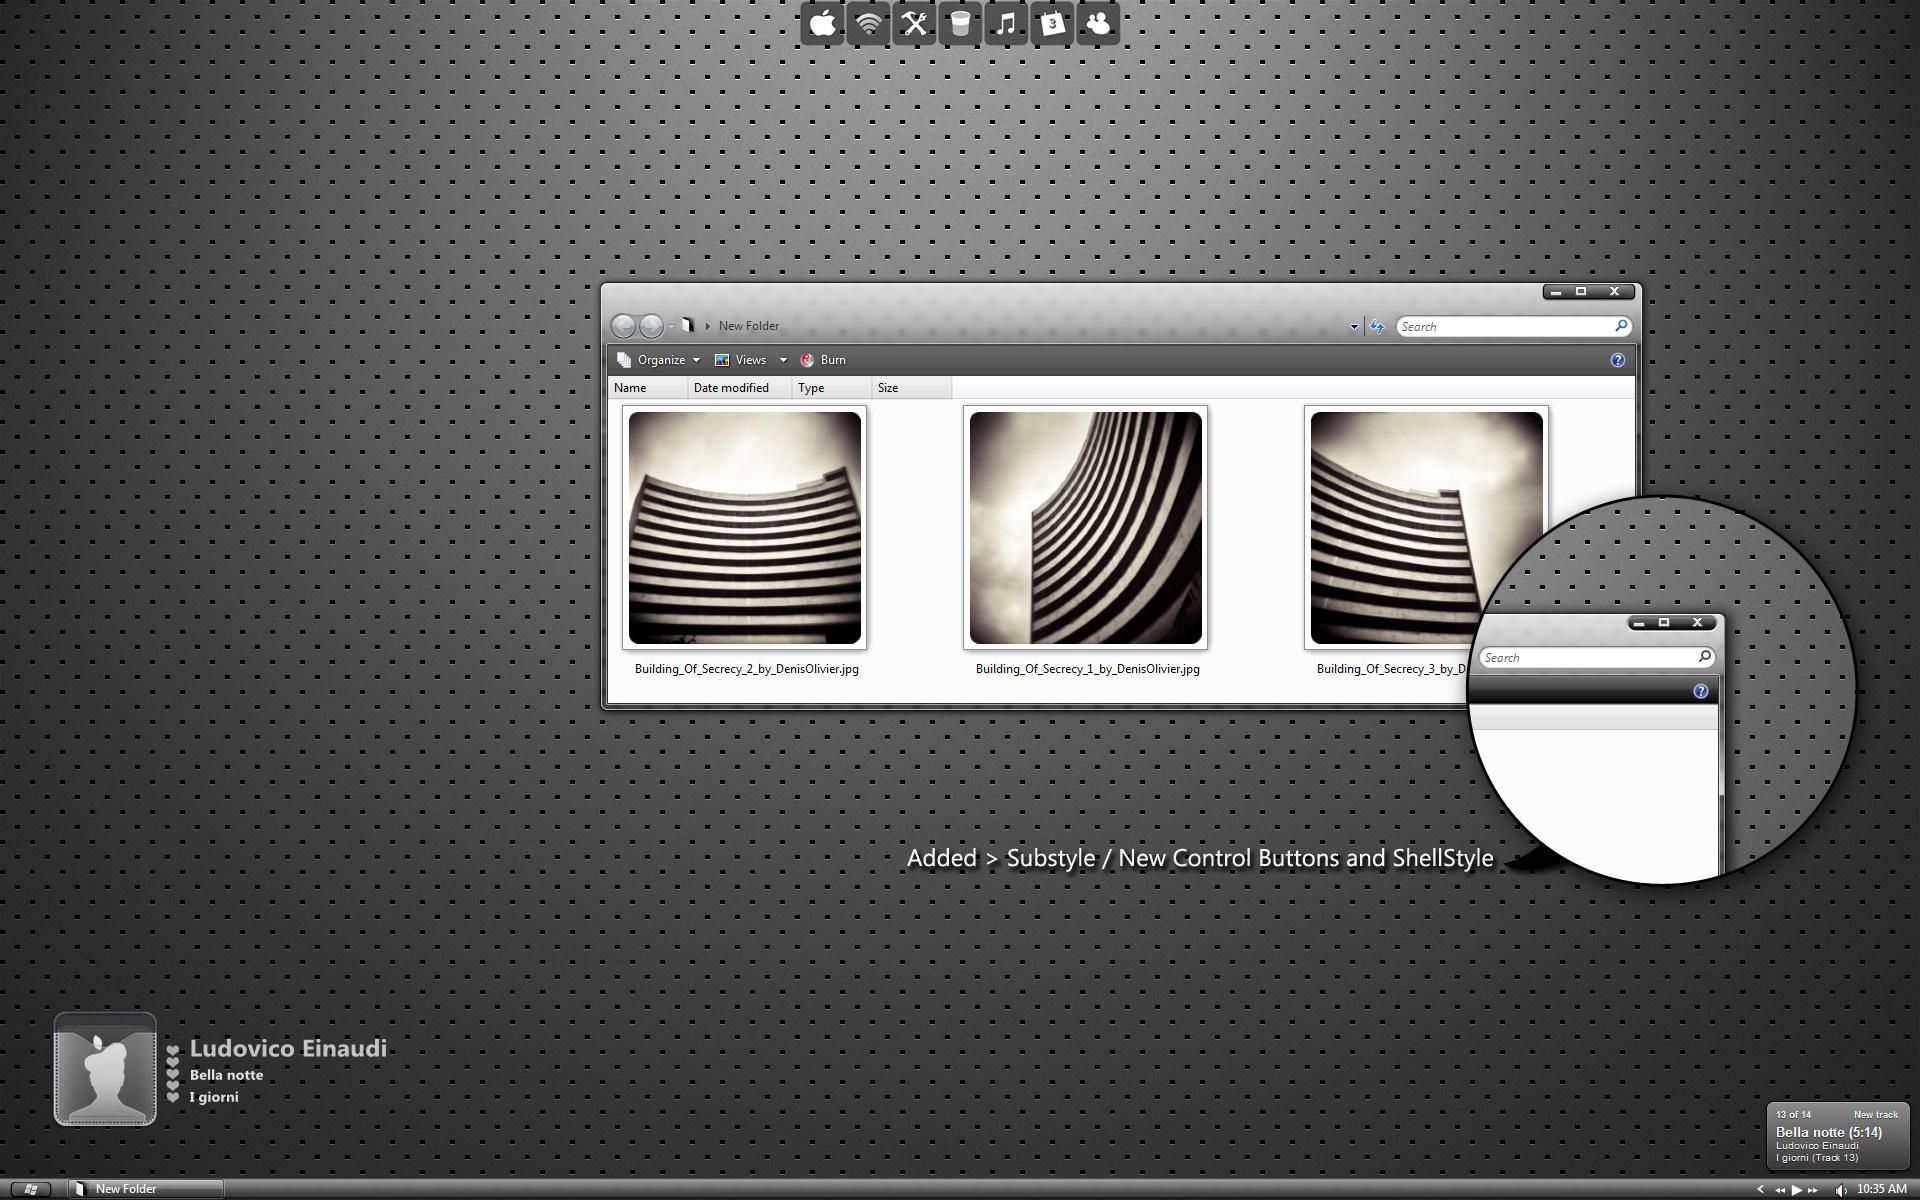 ][ اروع الثيمات للفيستا 2009 - Vista Themes 2009 ][ White_by_dimage